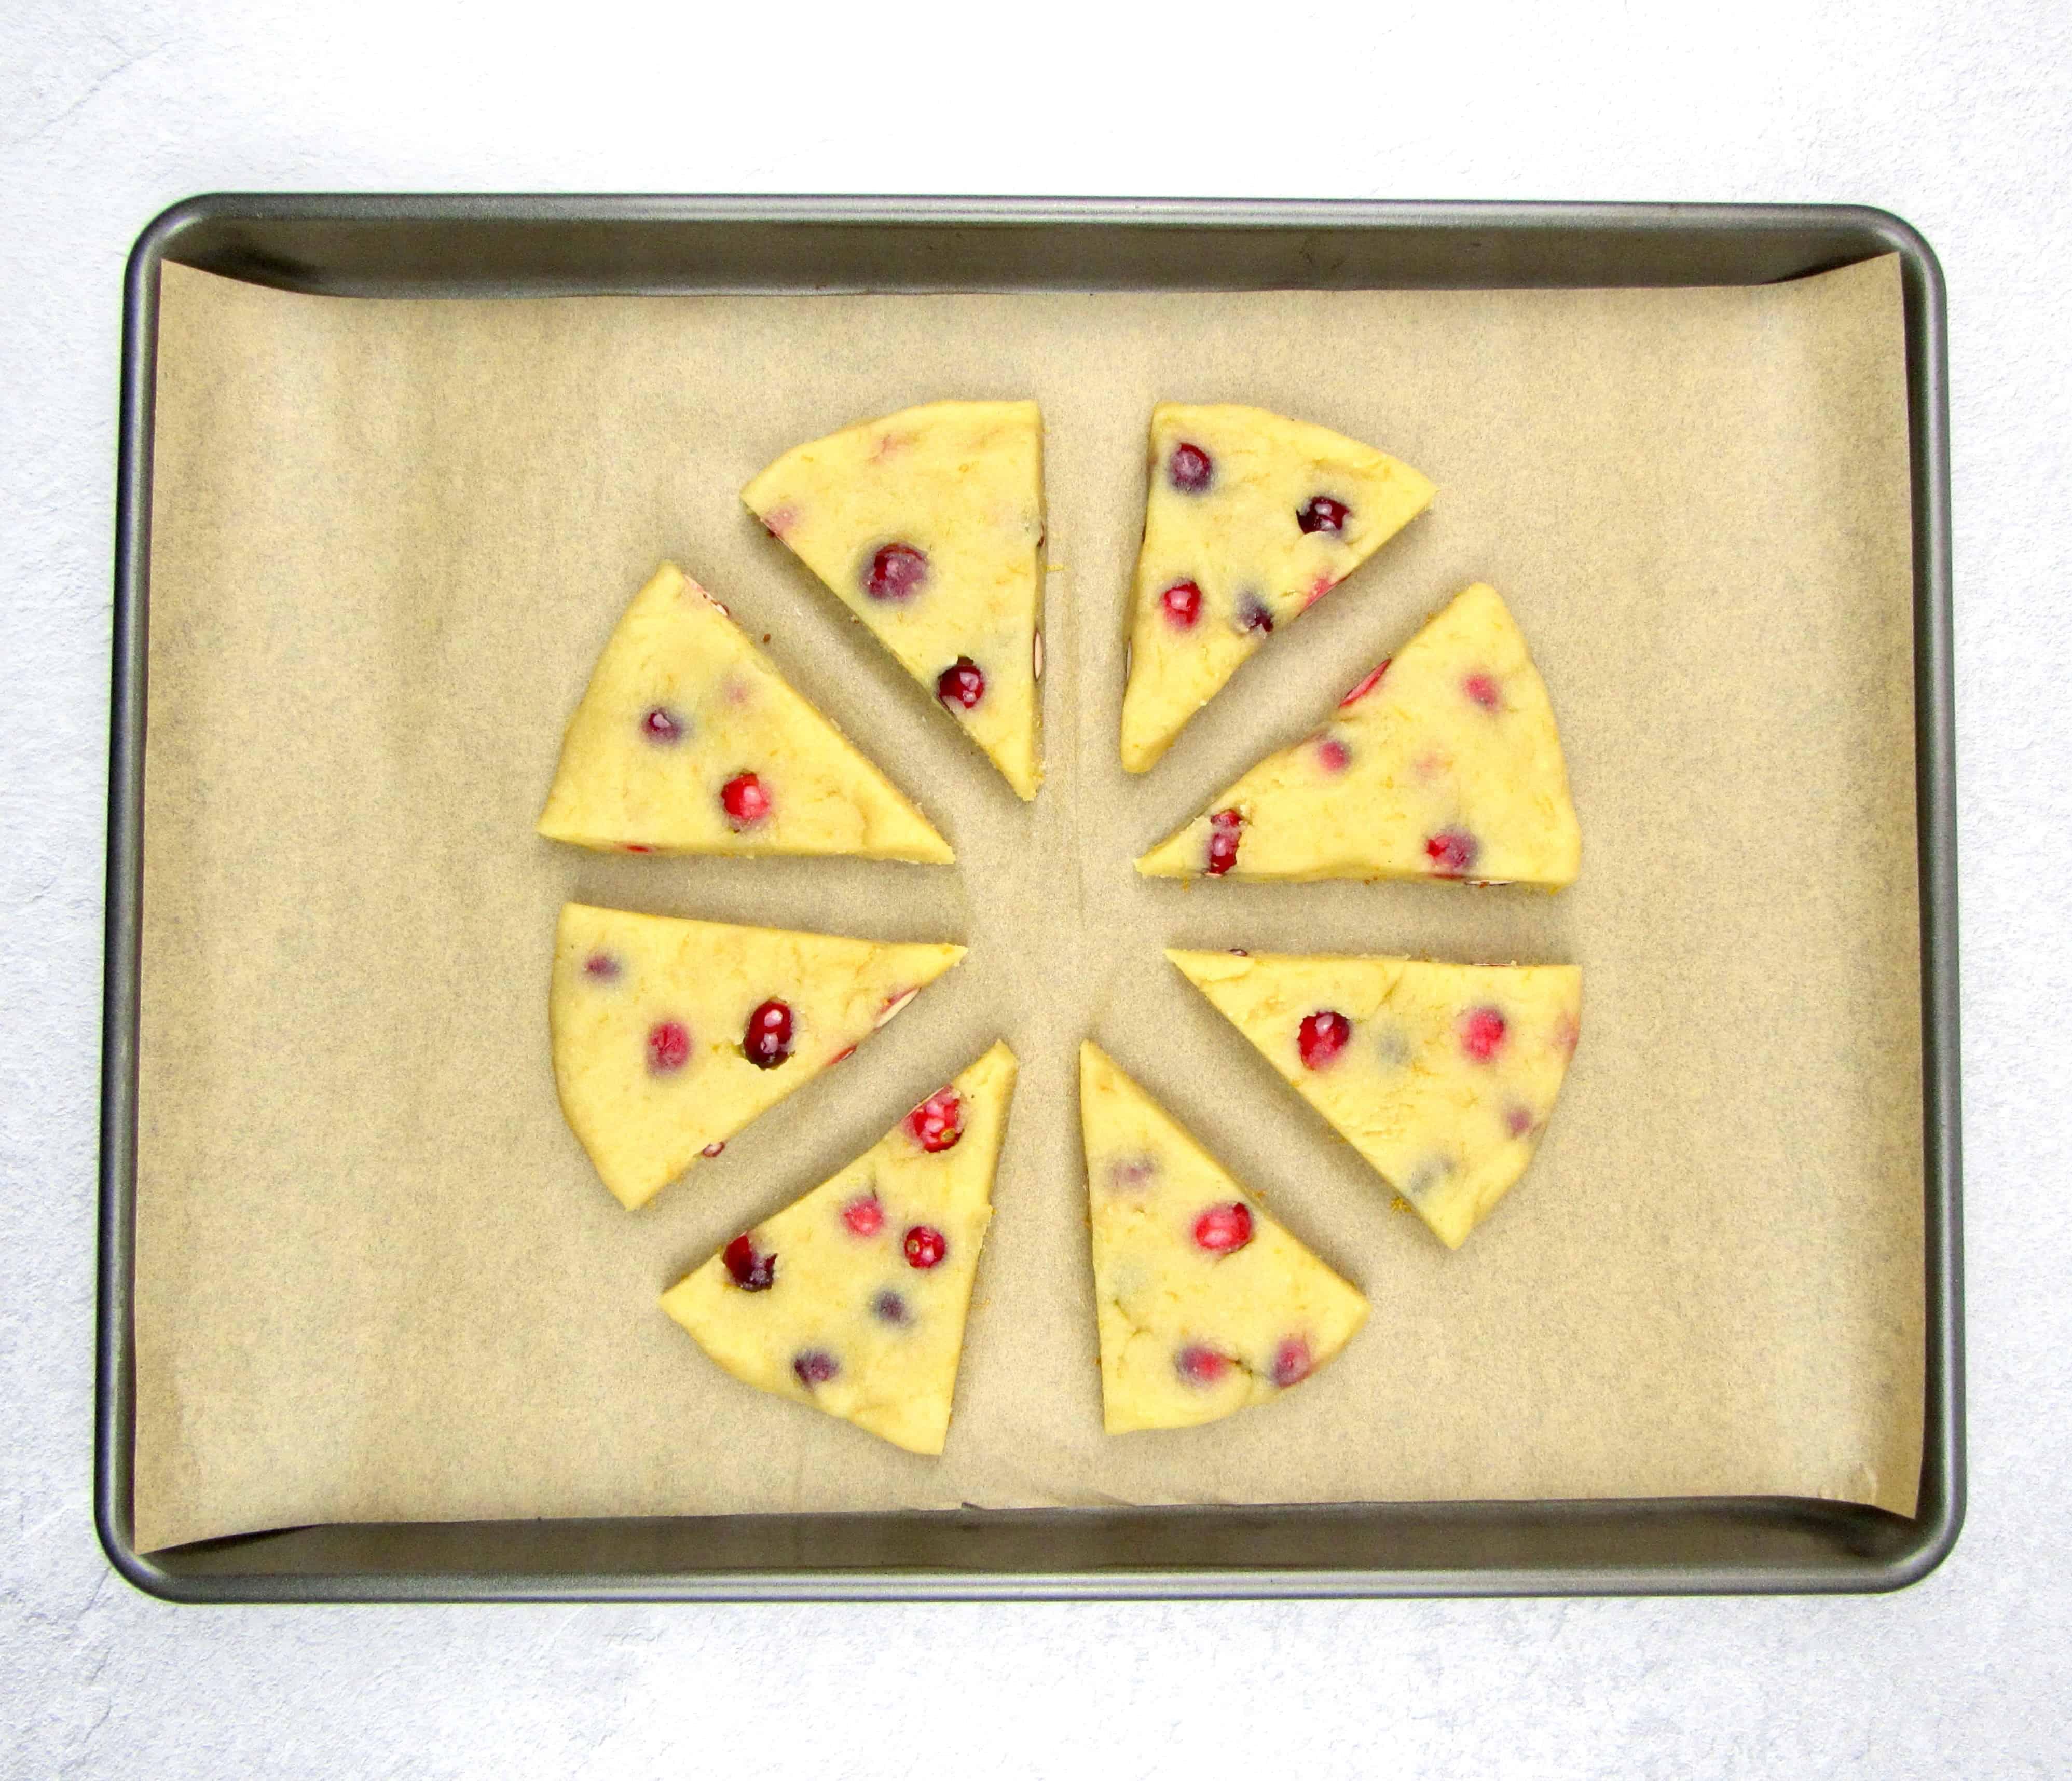 scones dough on sheet pan cut in 8 wedges